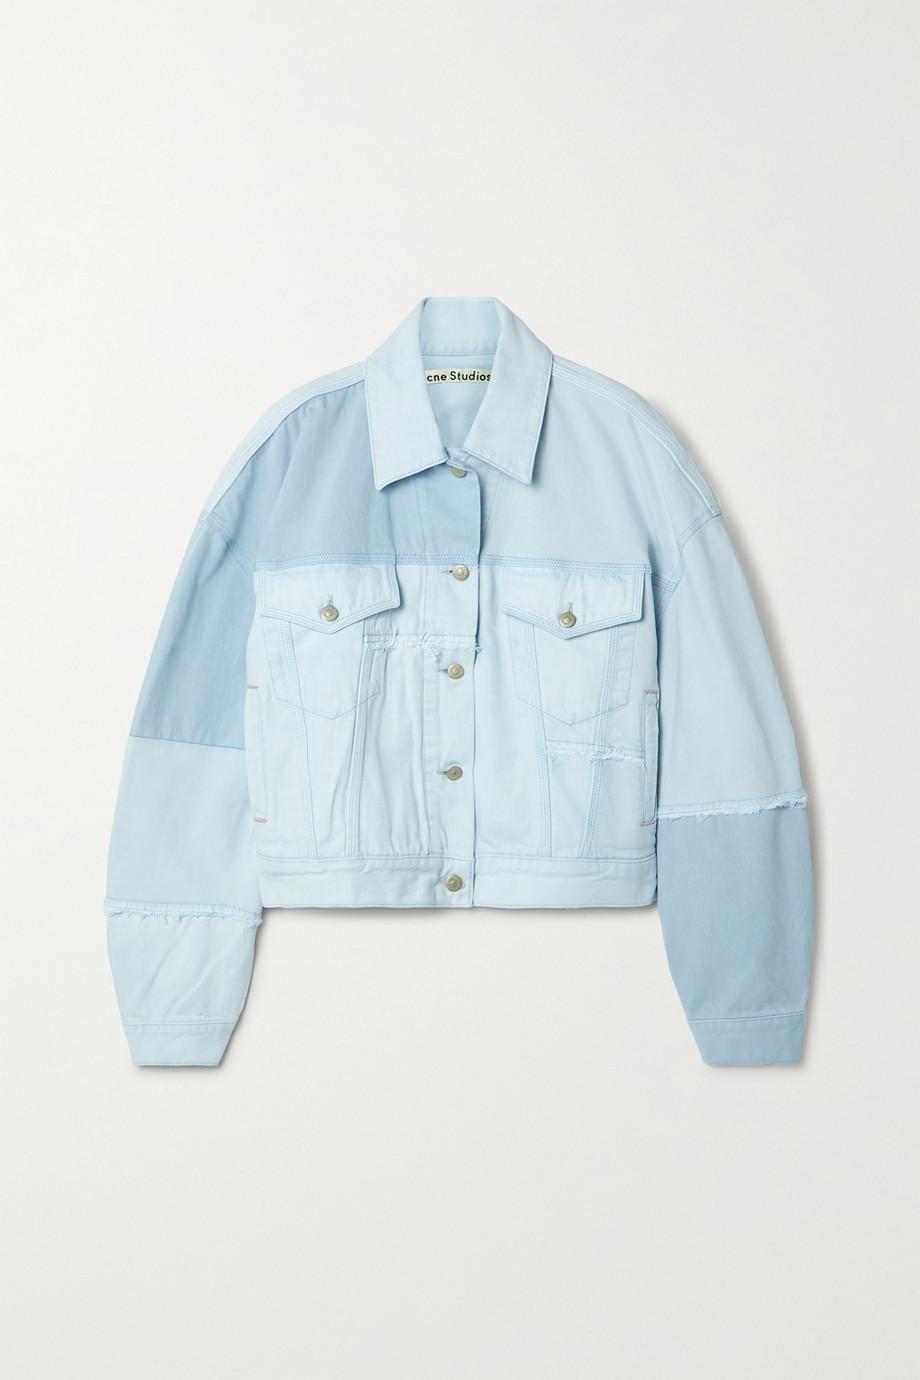 Acne Studios 【NET SUSTAIN】大廓形毛边拼缝有机牛仔布短款夹克